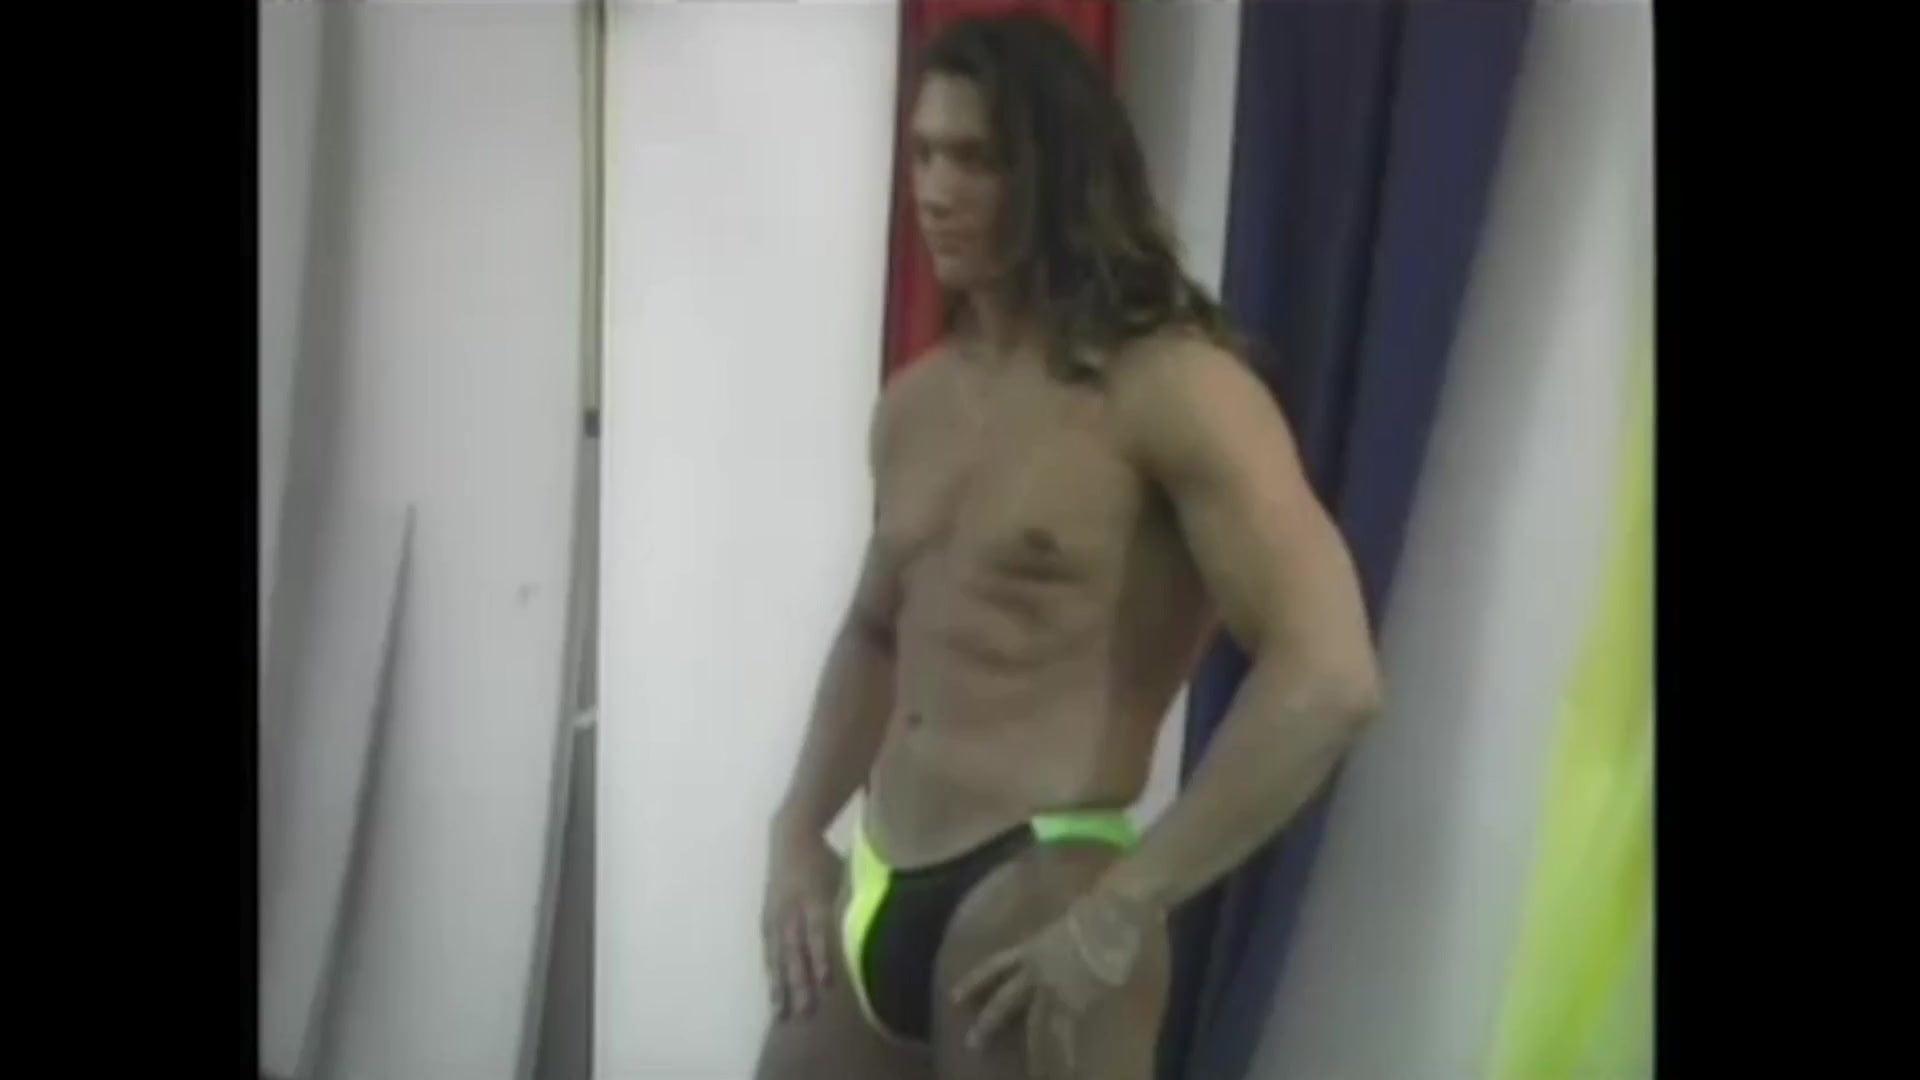 Steve Ryder a.k.a. Danny Celaya is a thong male model